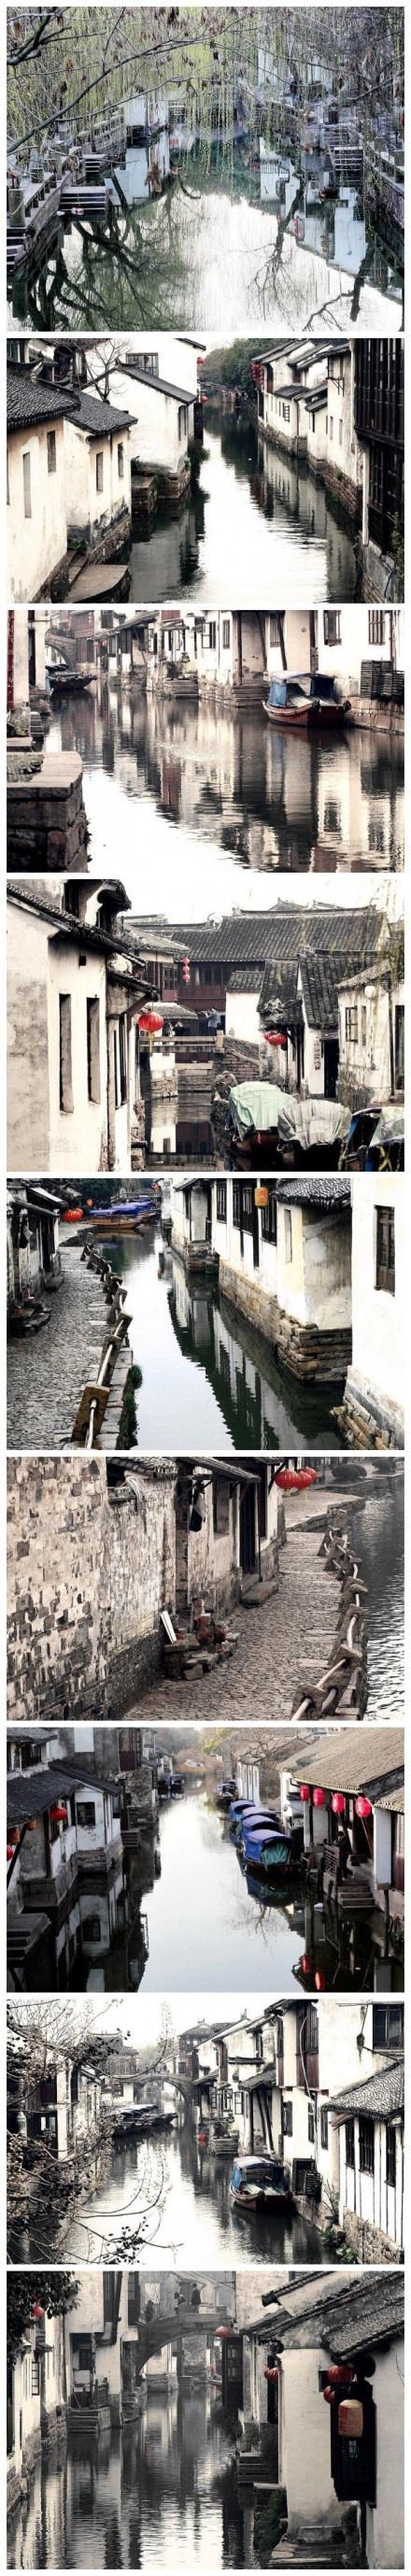 suzhou, Anhui province